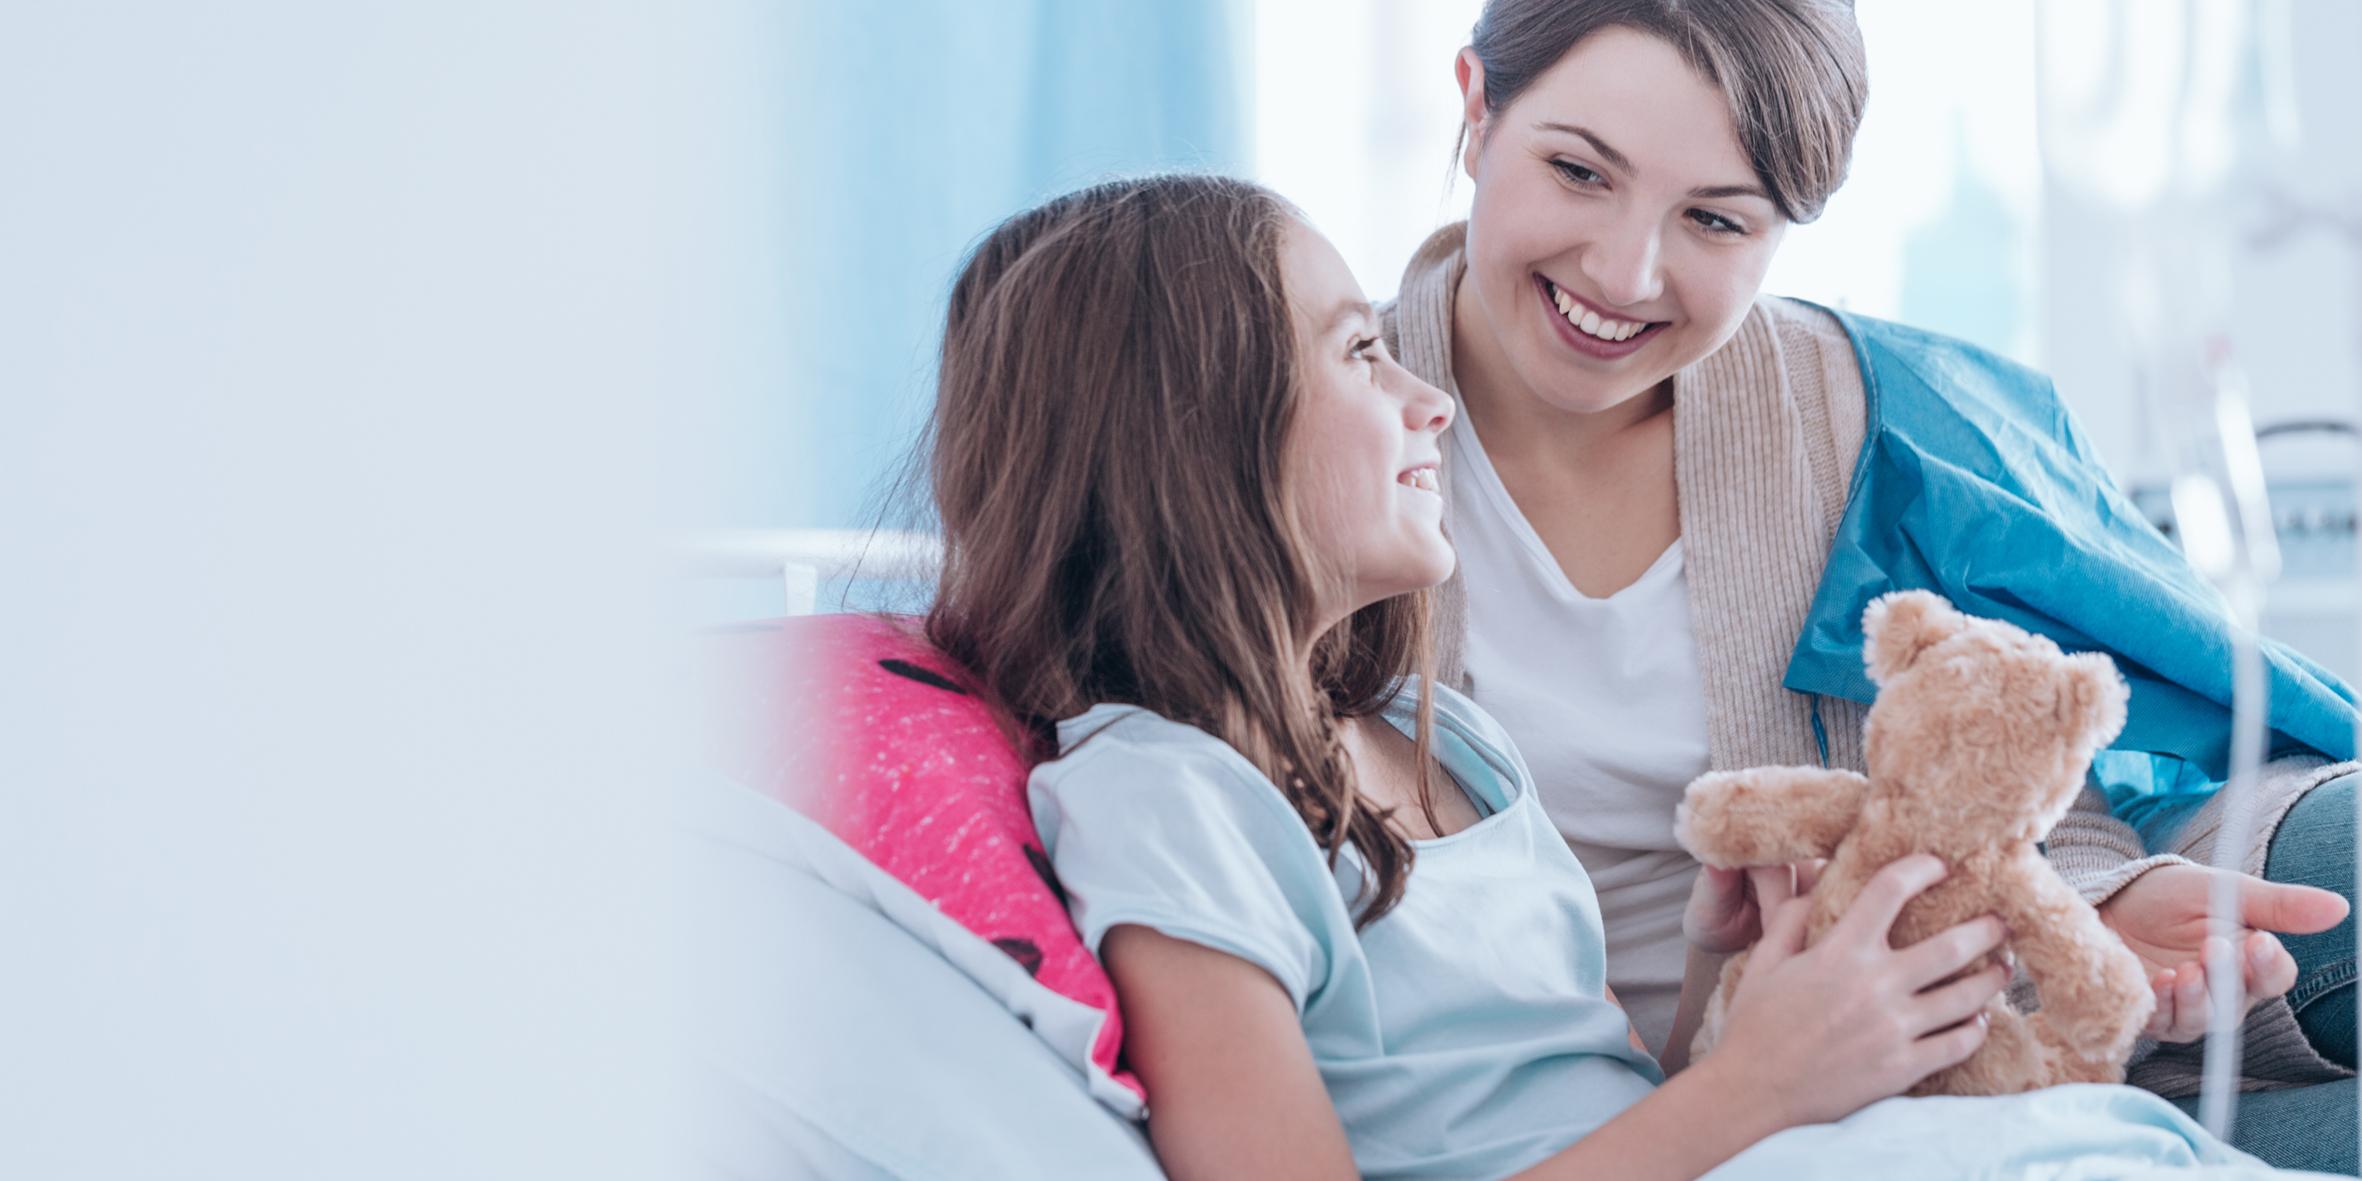 Semalytix' and Boehringer Ingelheim's innovative social media study on the parental experience around Crohn's disease wins EphMRA award